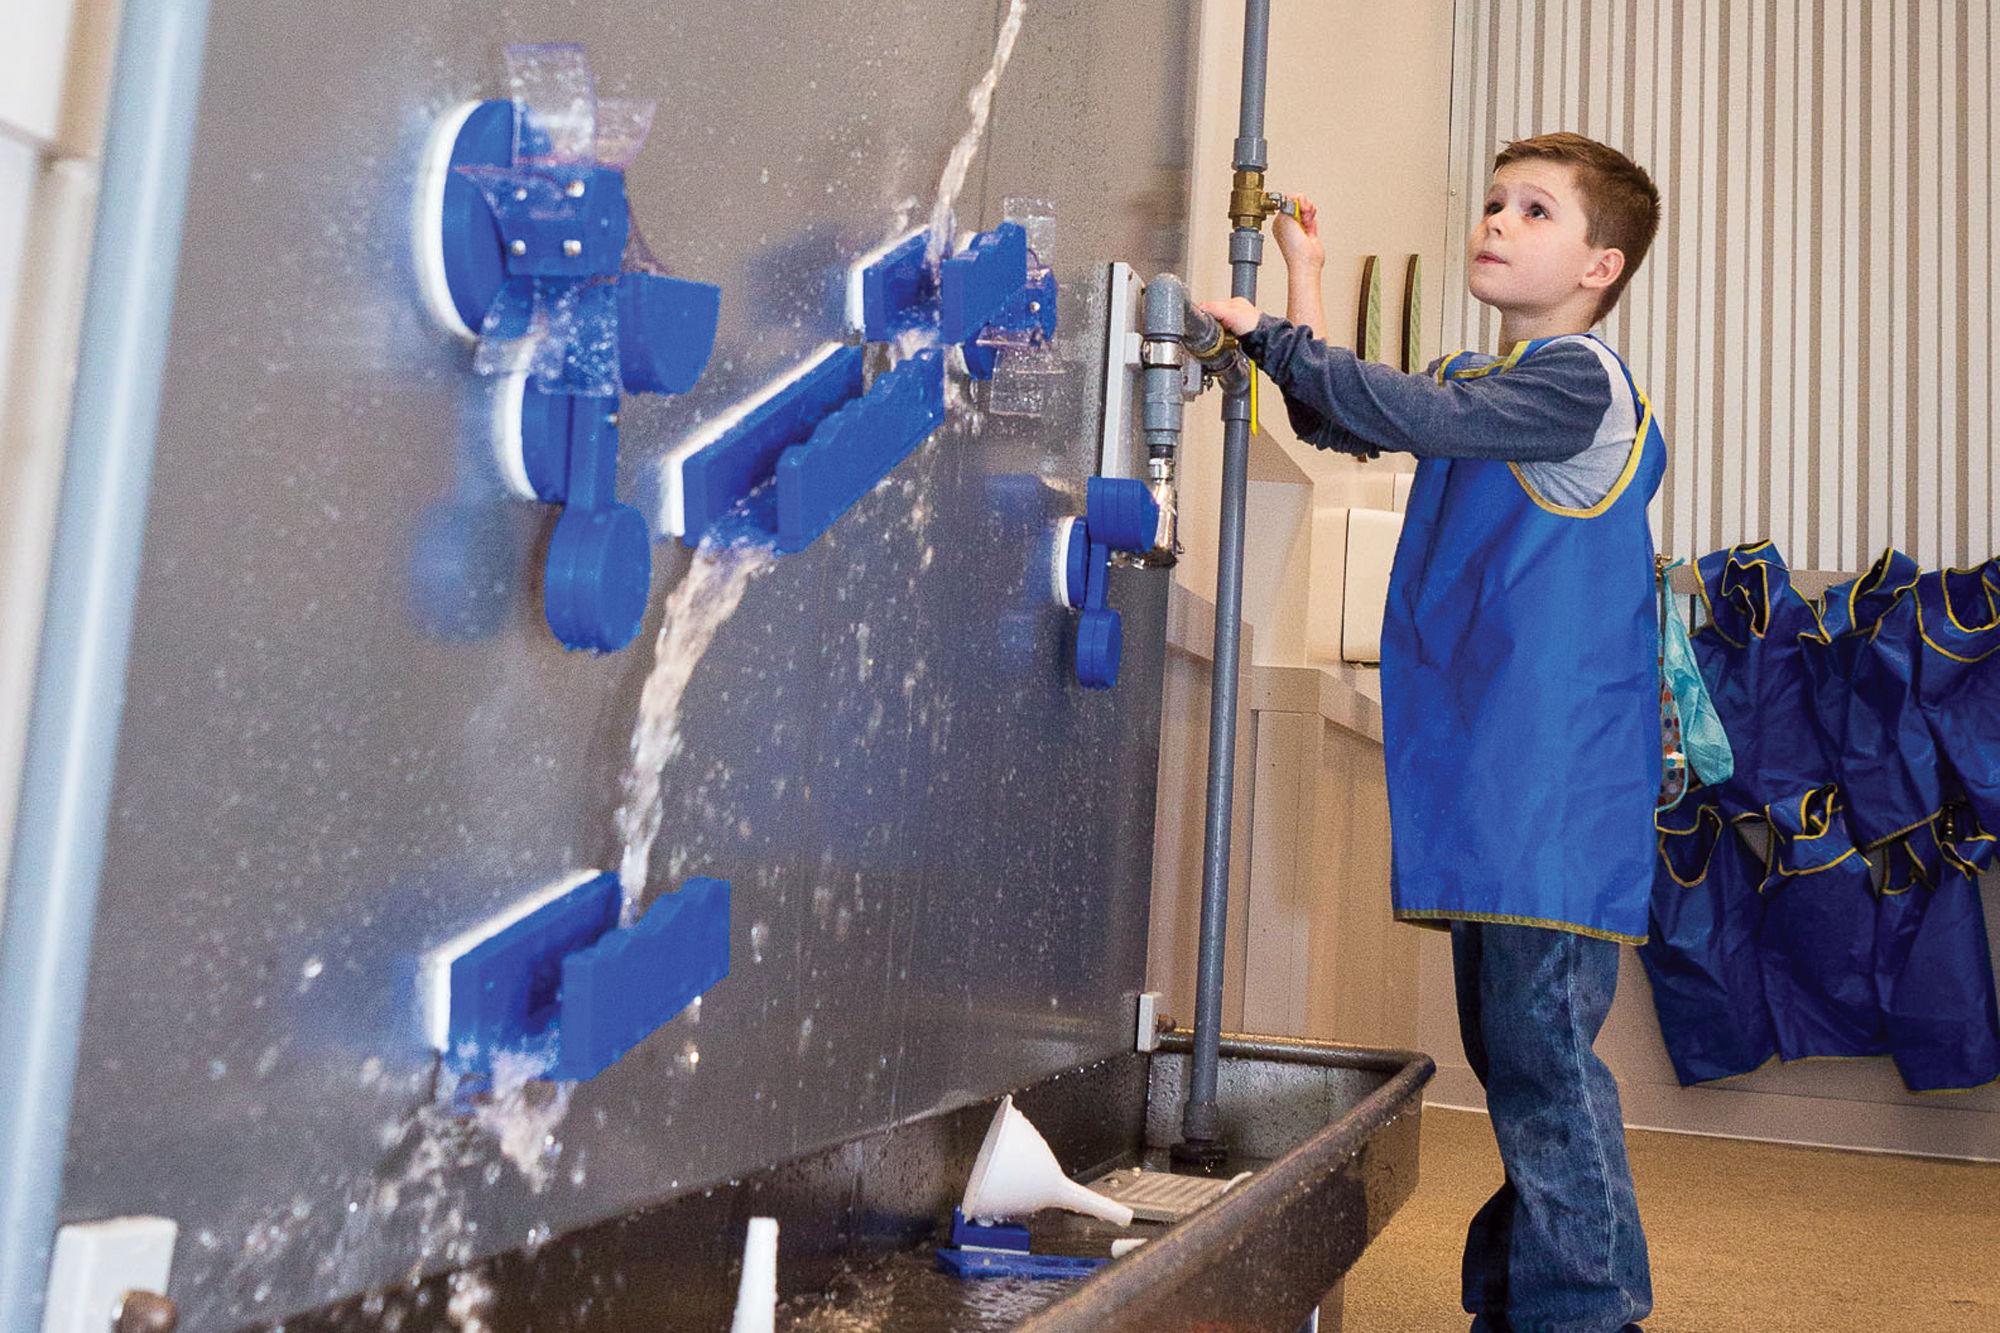 Kidsquest childrens museum mlrtje